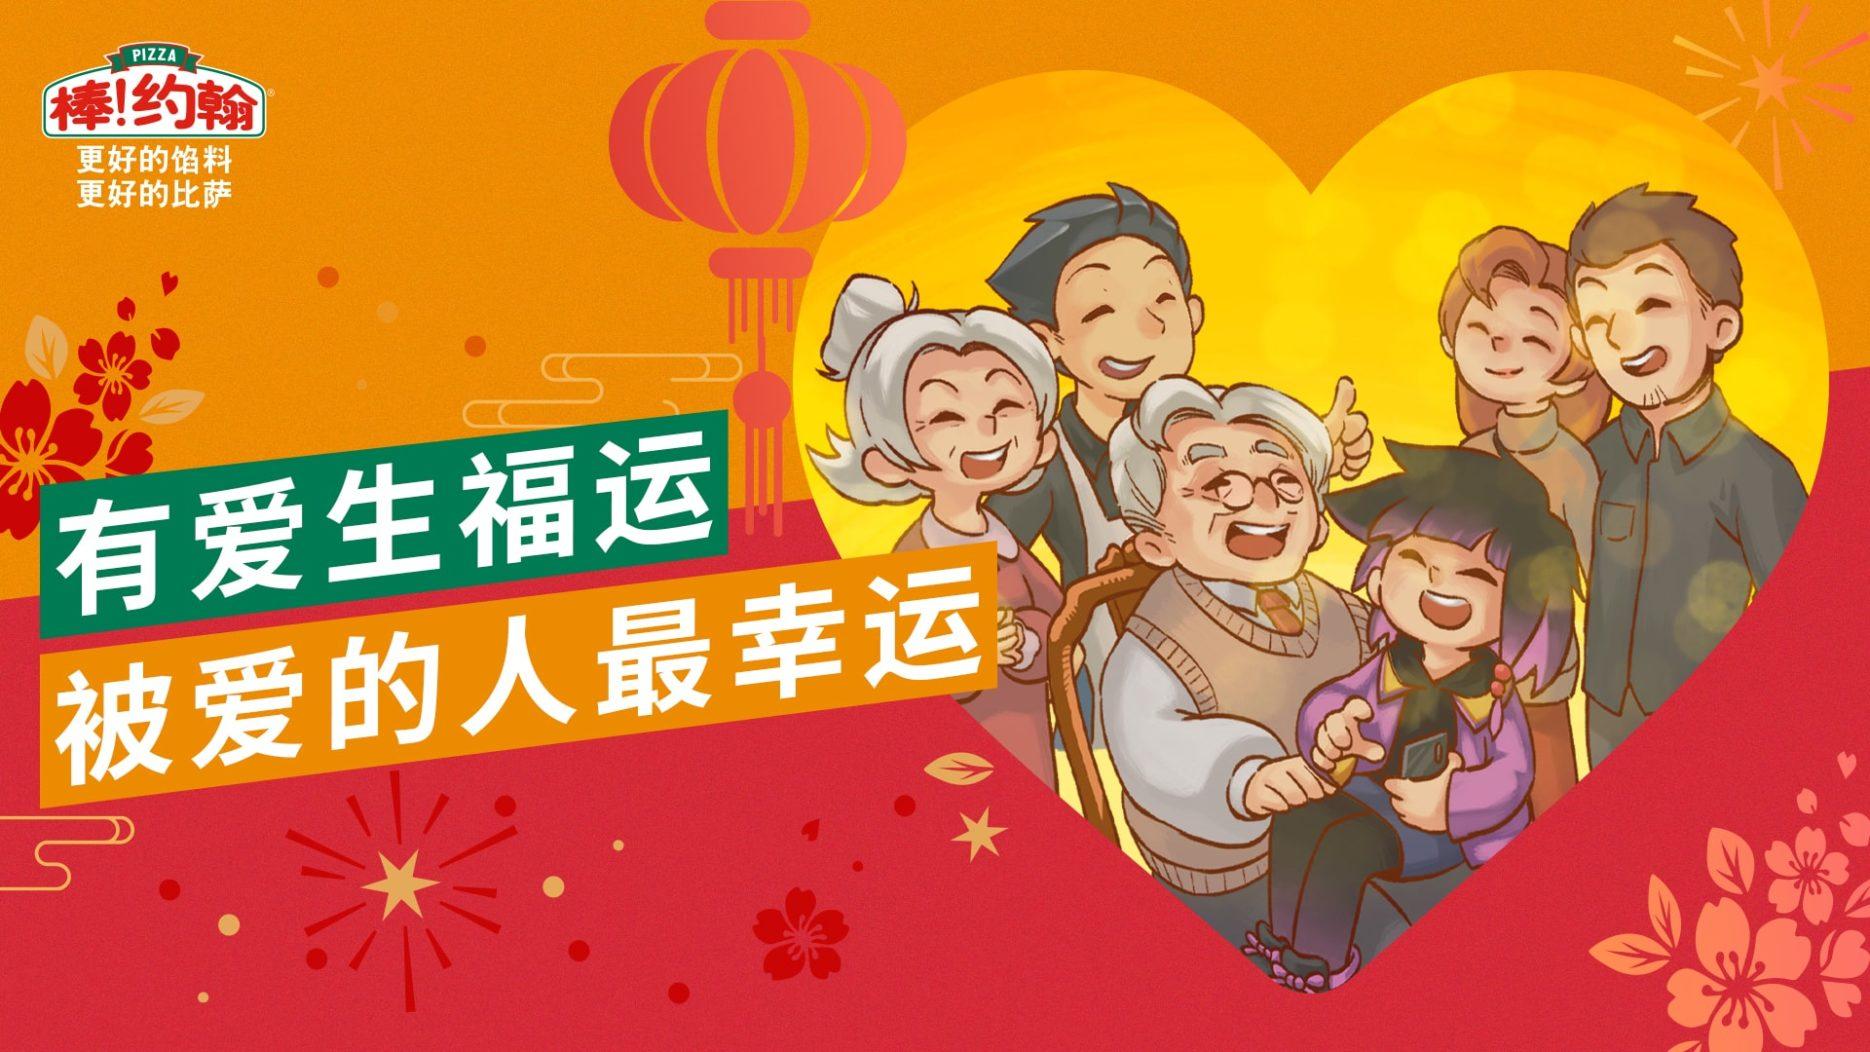 Papa John's Chinese New Year campaign